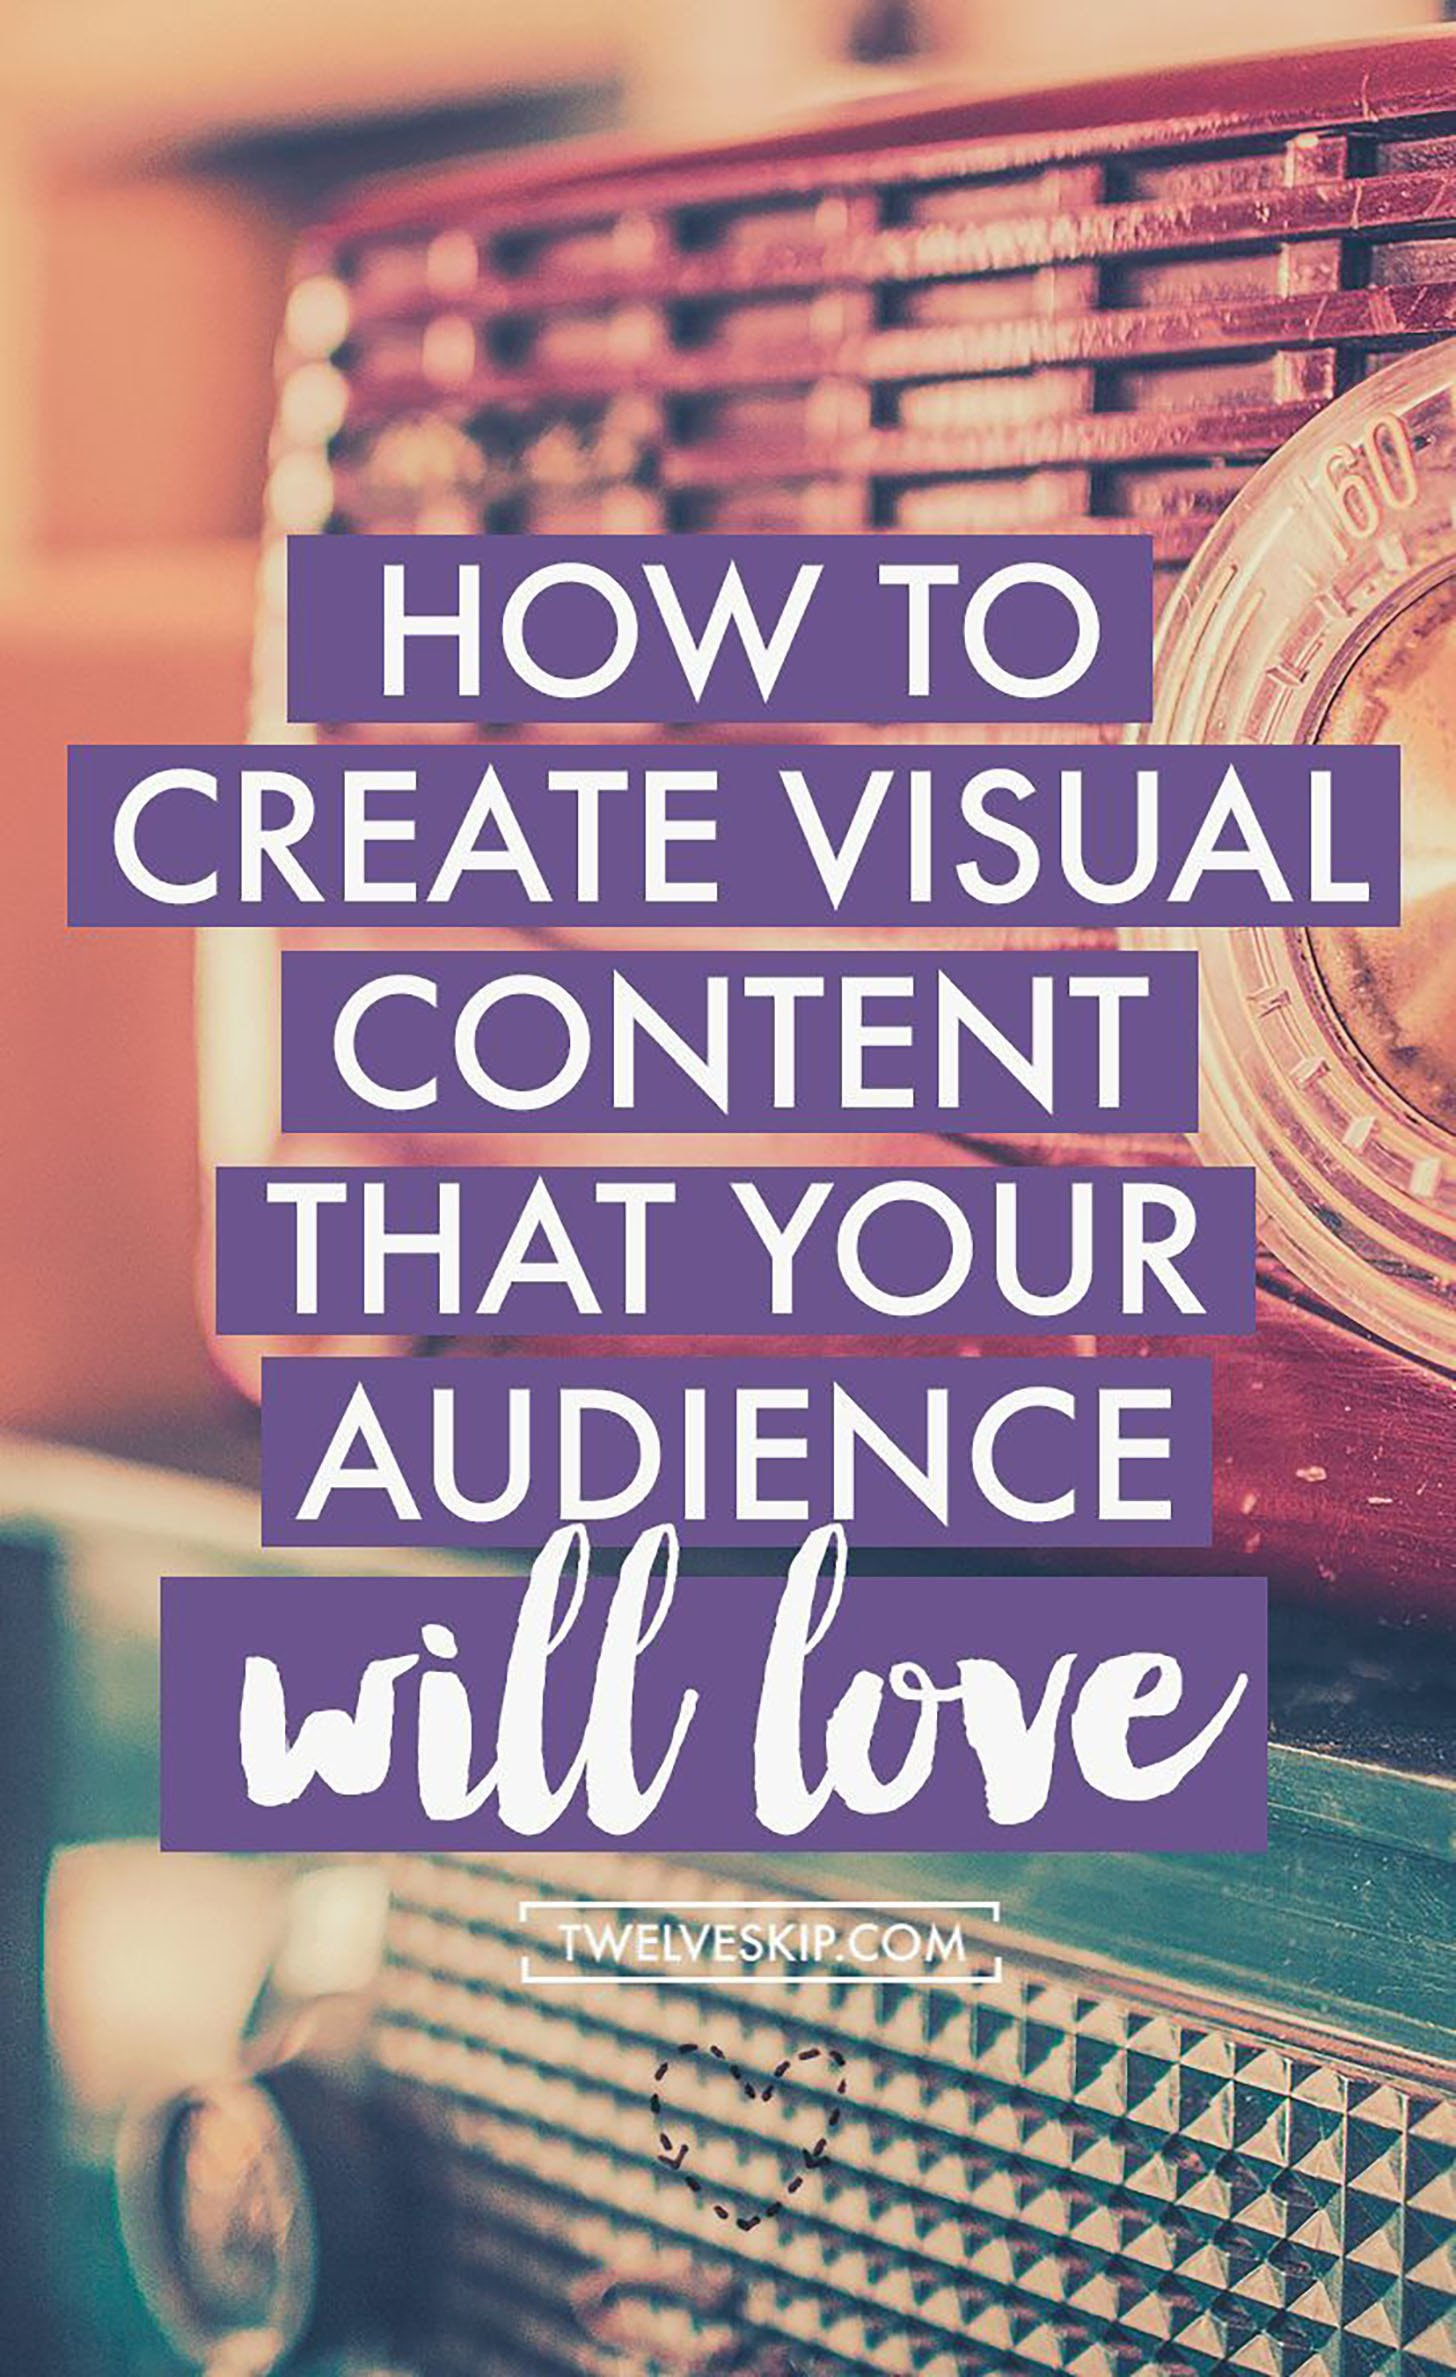 TwelveSkip blog post about visual content